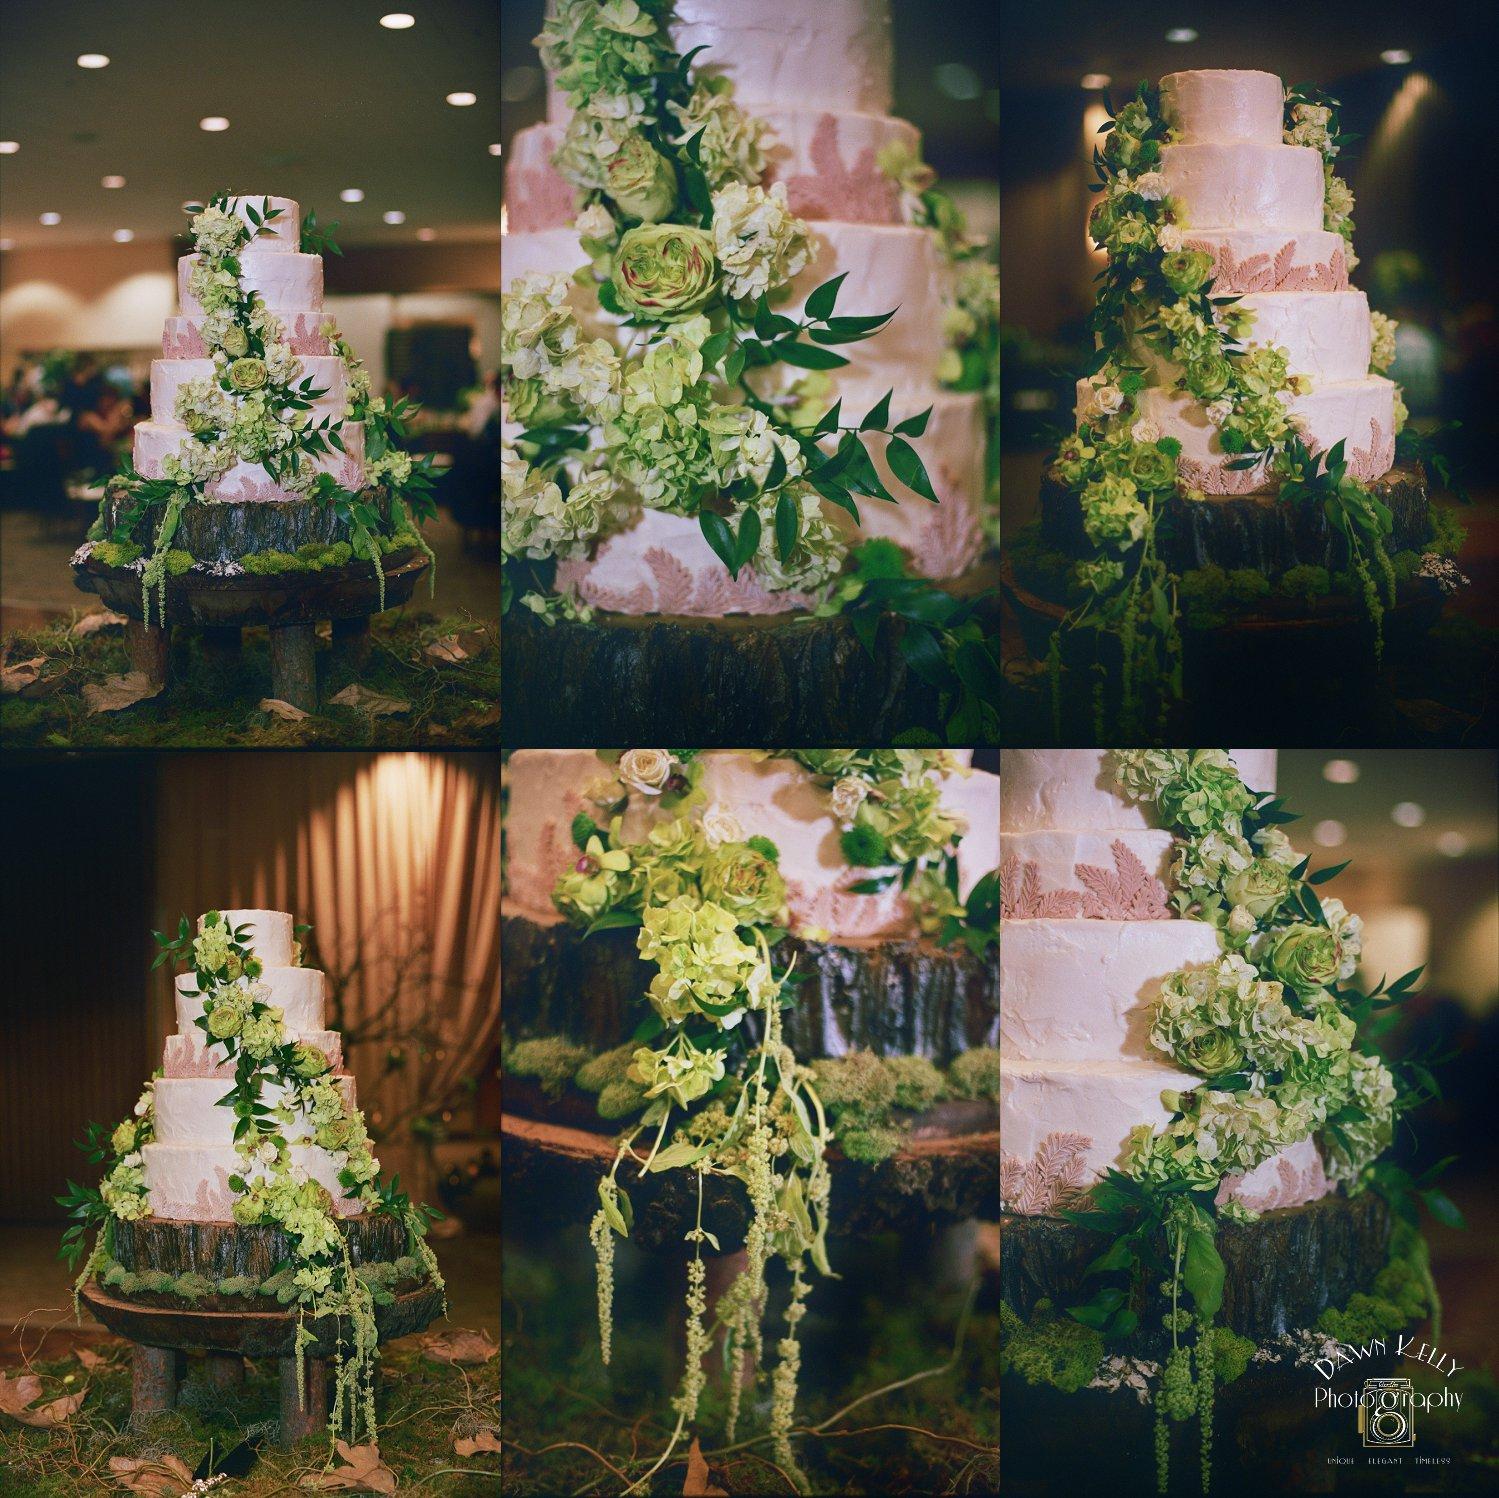 Wedding cake at Larsa Banquet Hall